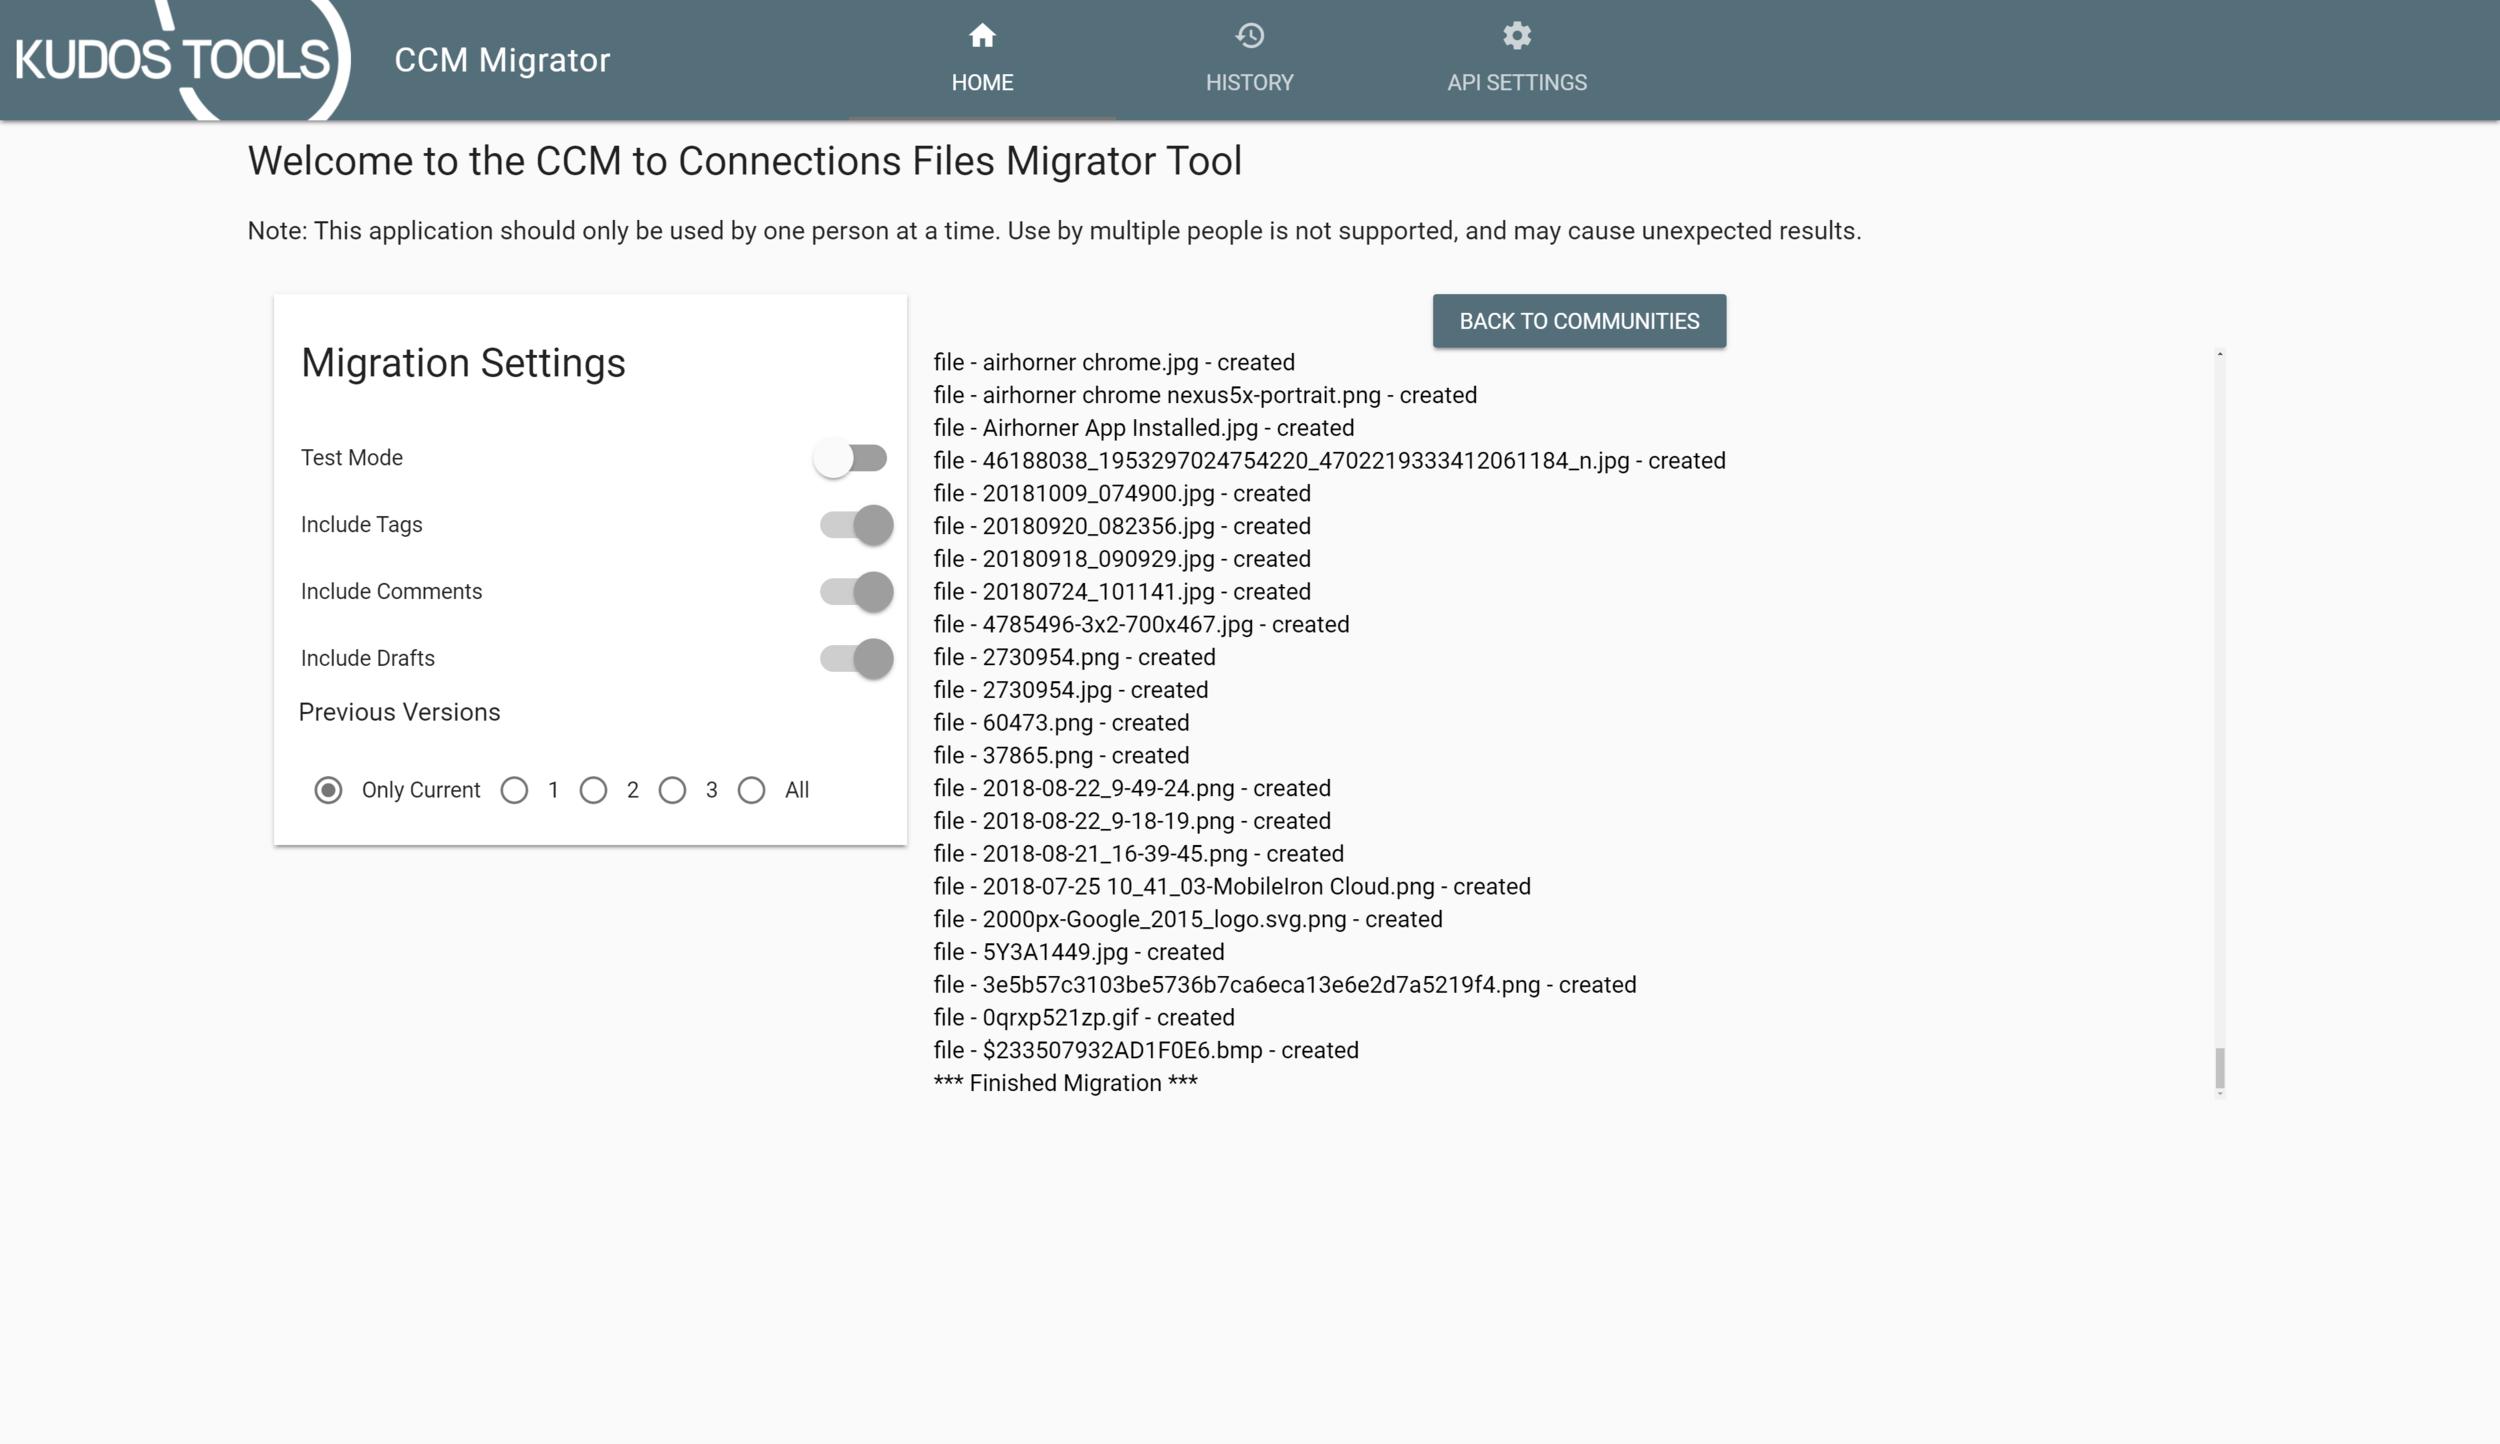 ccm-migrator.internal.isw.net.au_(4k) (1).png